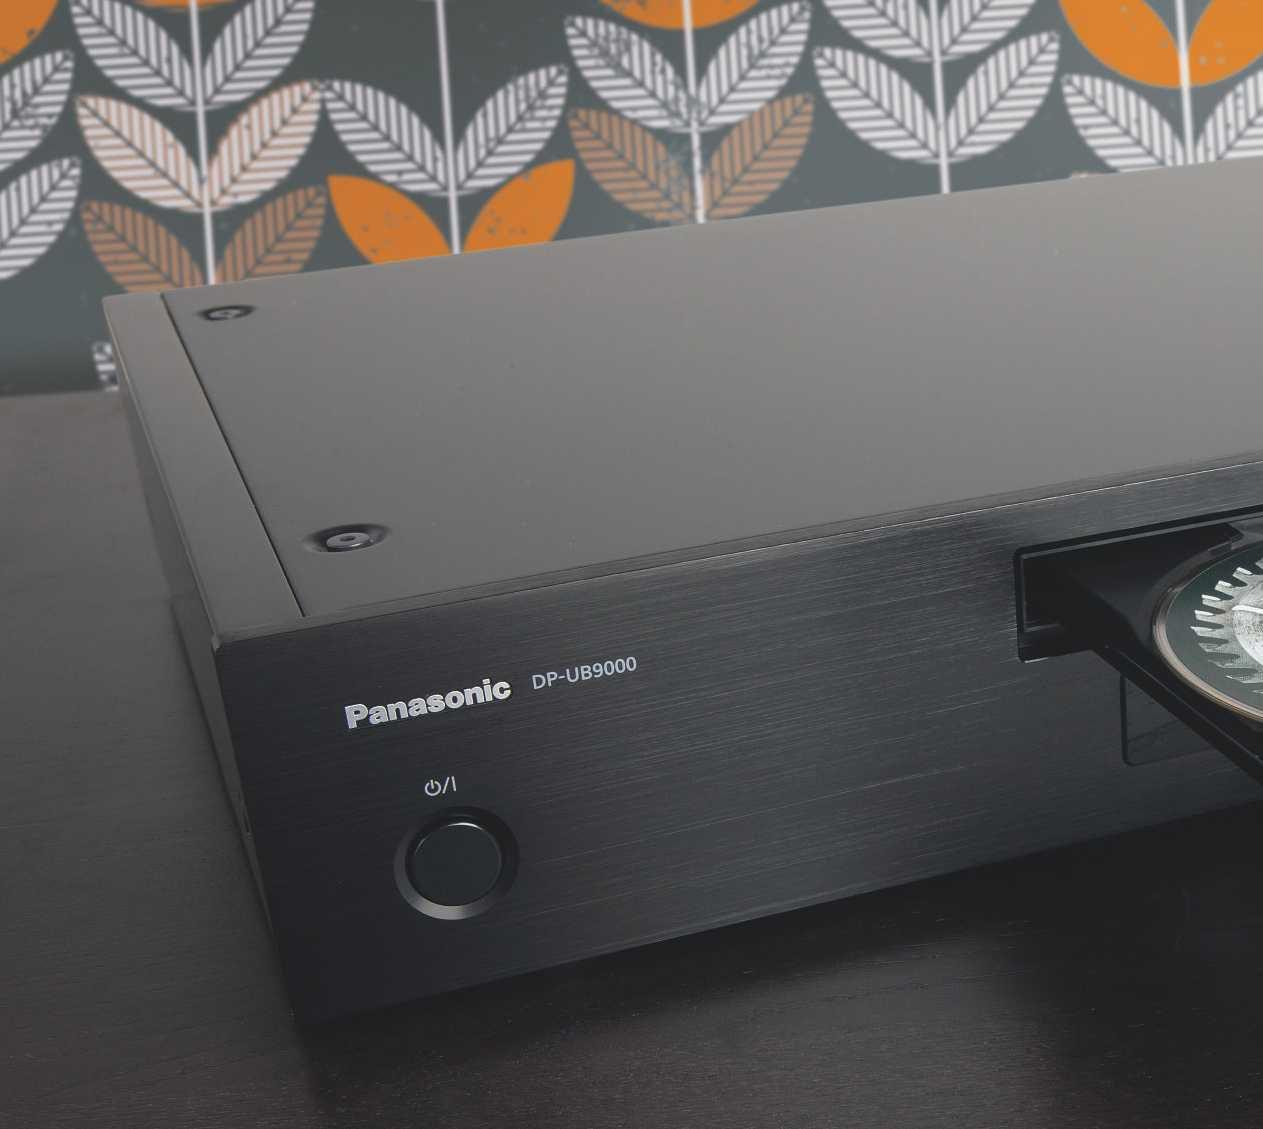 PANASONIC DP-UB9000 Review